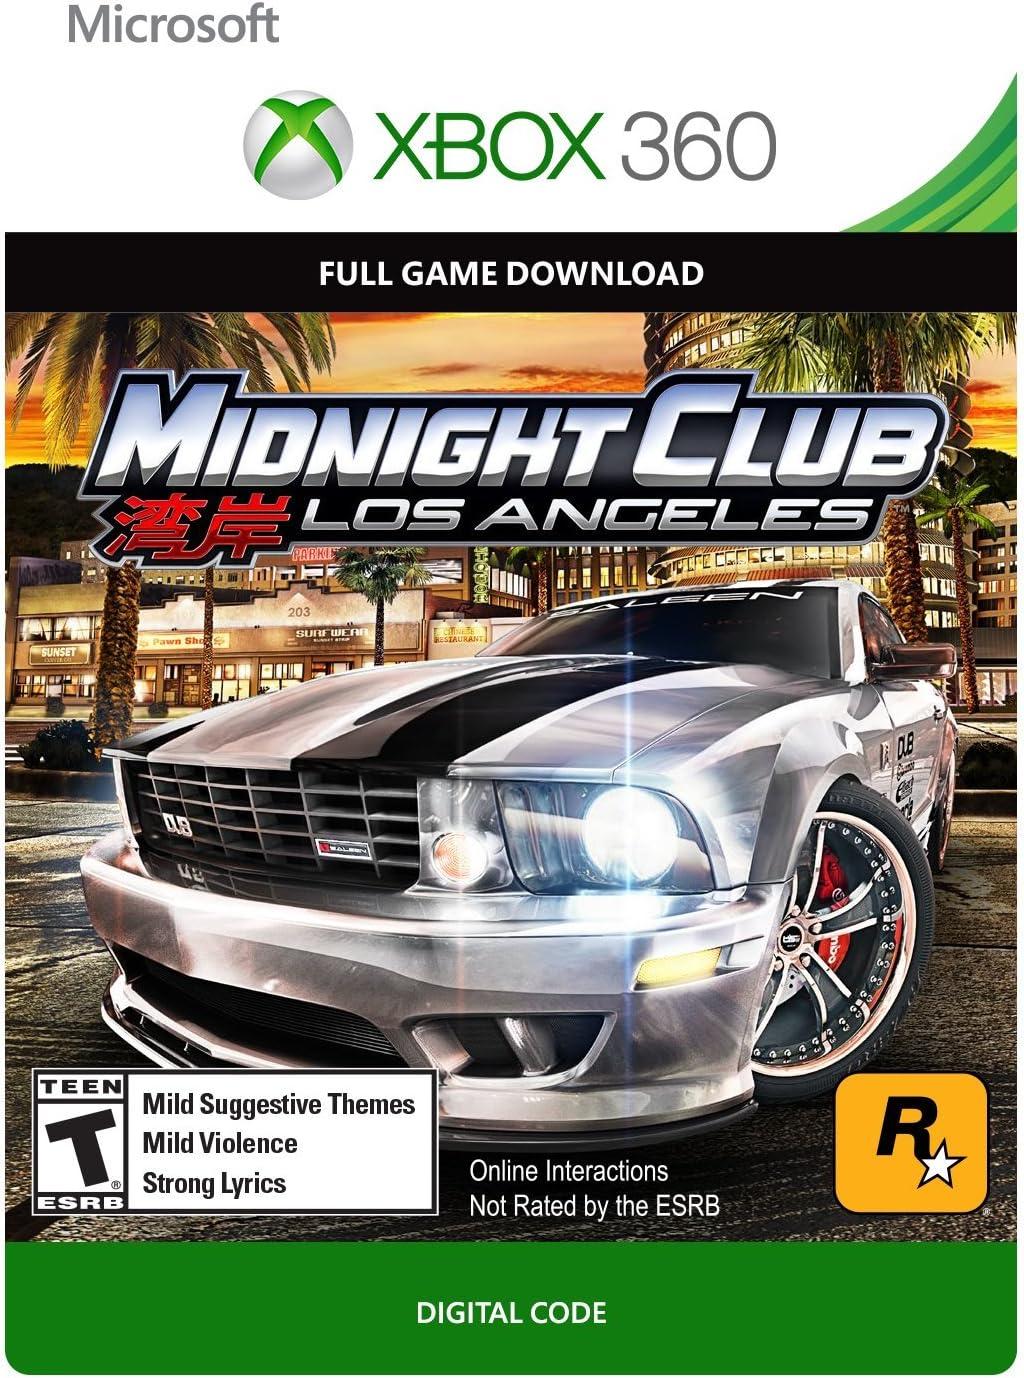 Amazoncom Midnight Club Los Angeles Platinum Hits Xbox - Midnight club los angeles map expansion